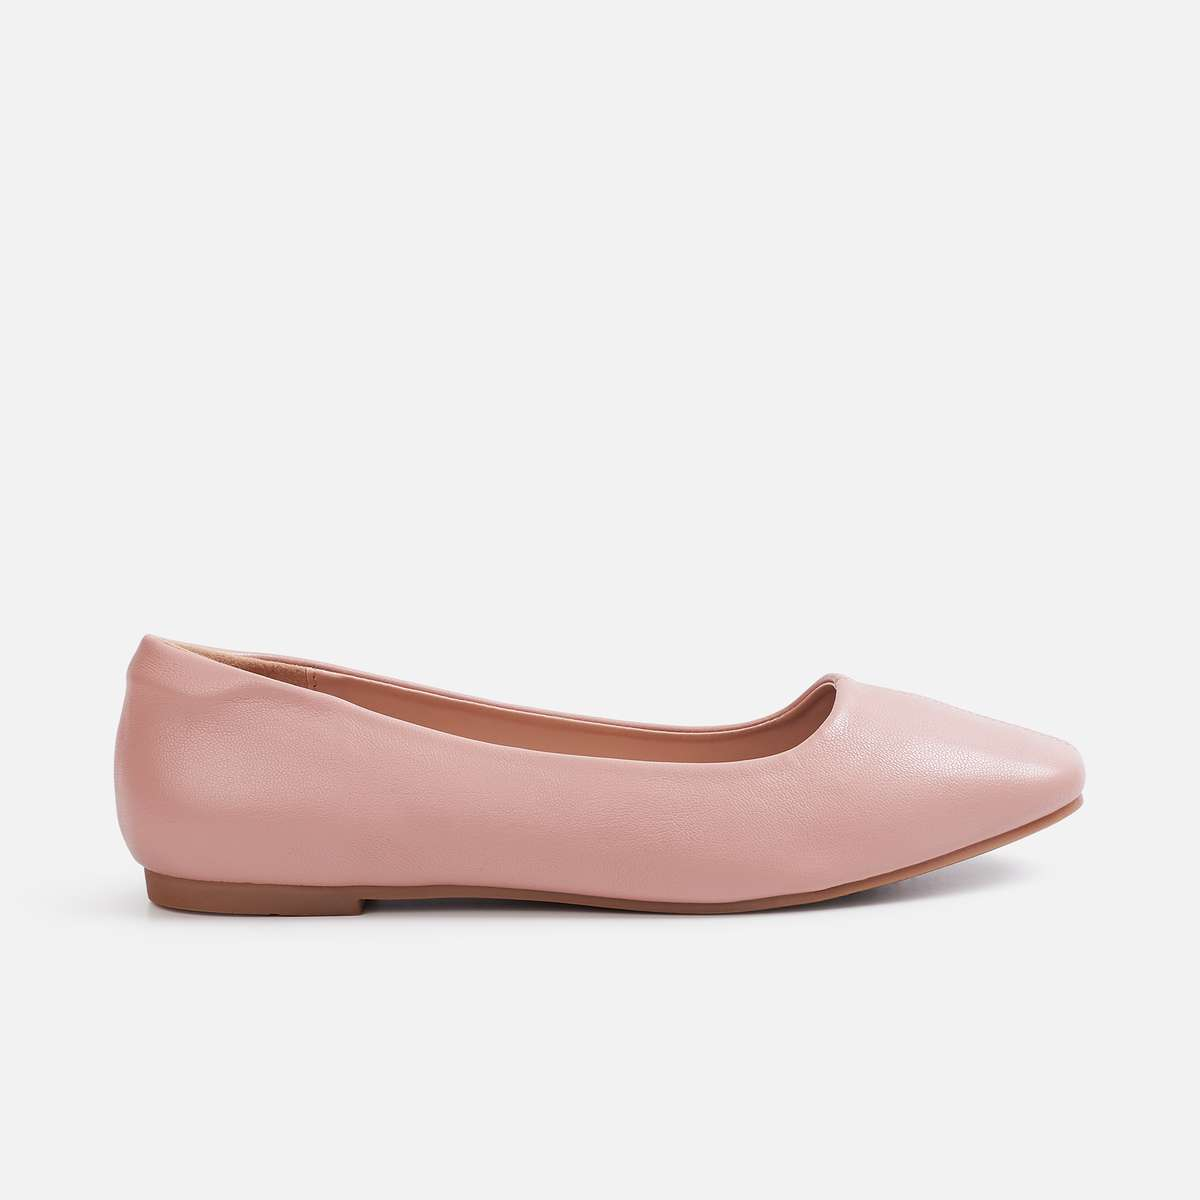 3.ALLEN SOLLY Women Solid Round Toe Ballerinas